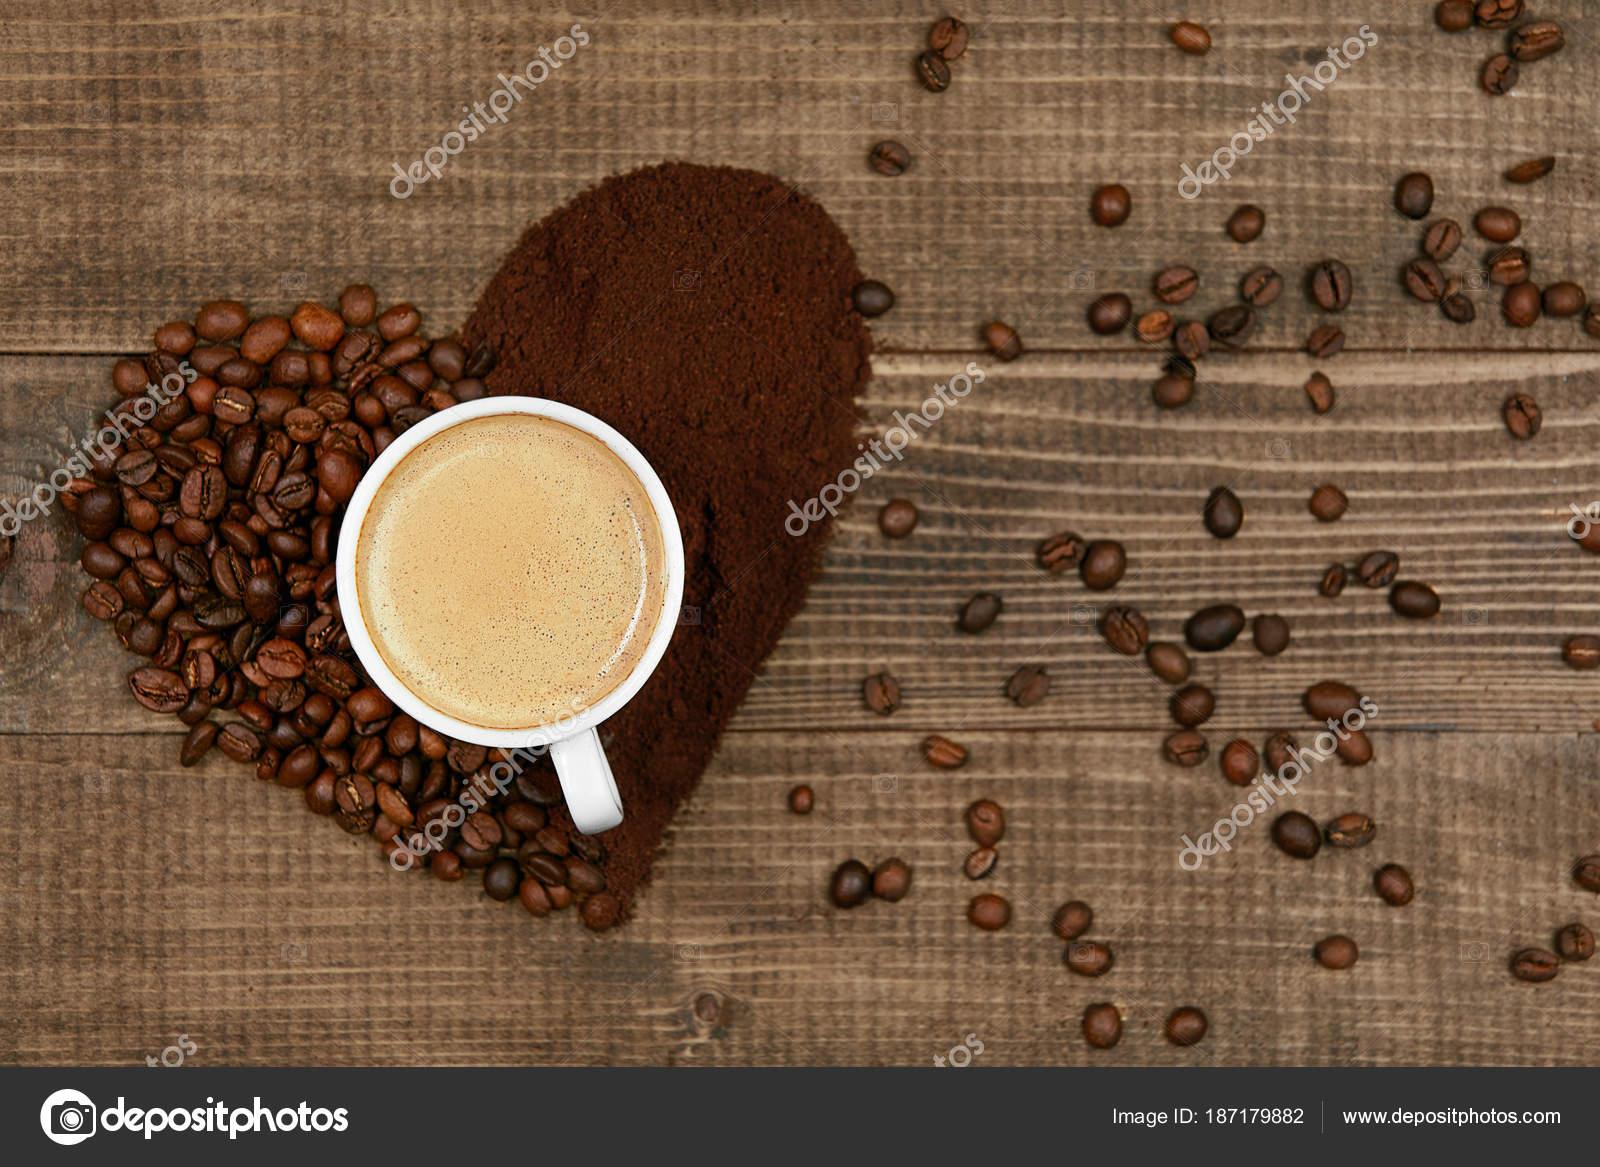 love coffee tasse de cafe et cafe coeur photographie puhhha c 187179882